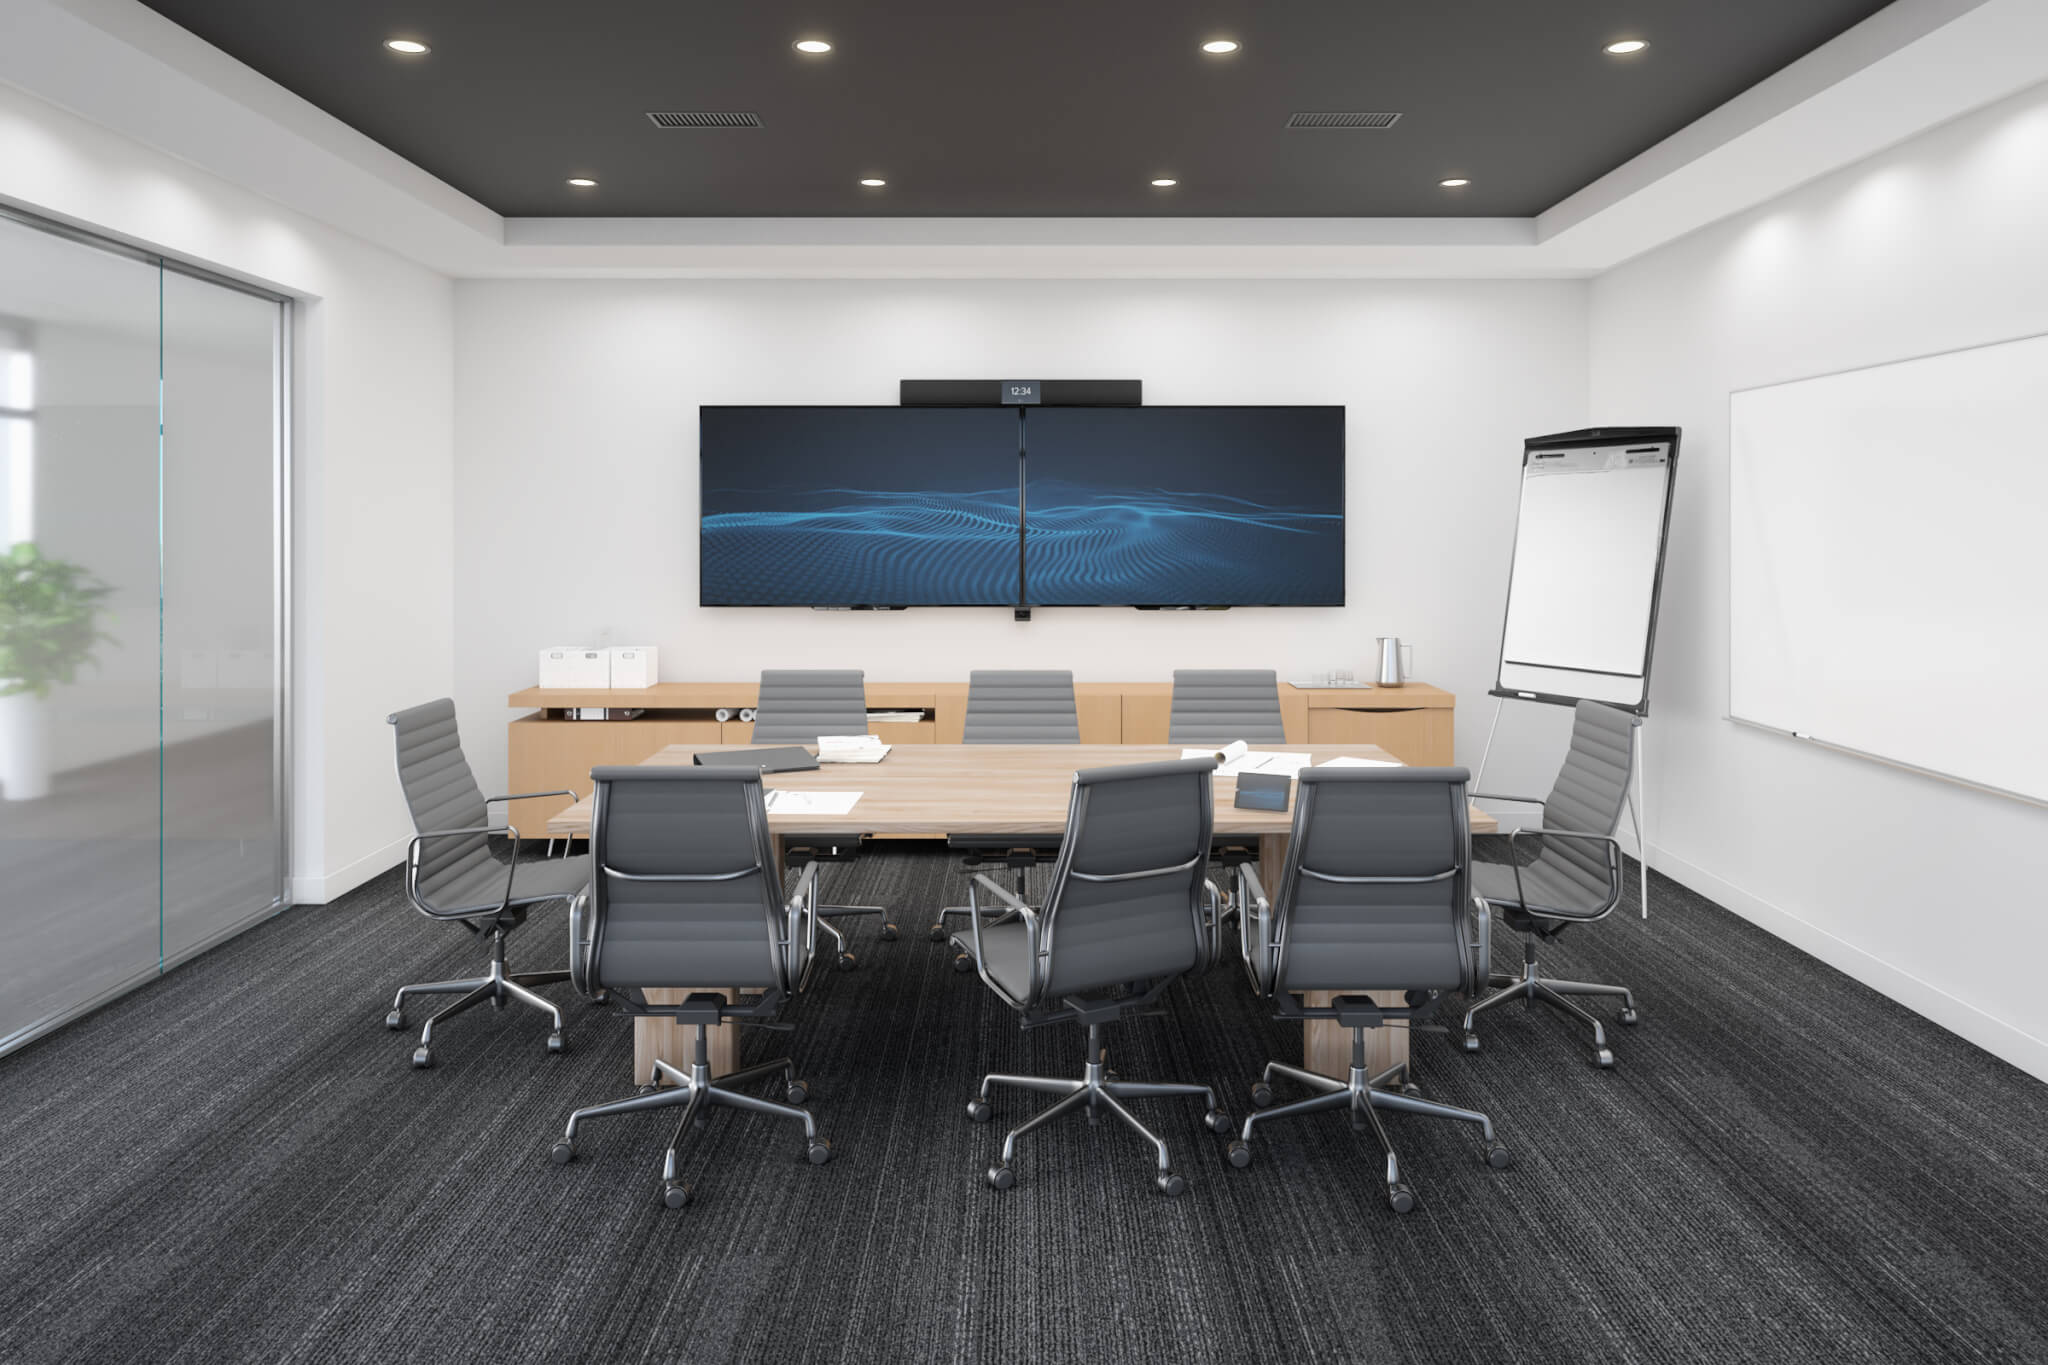 meeting room small inside HDL200 2019_12_17 72 dpi